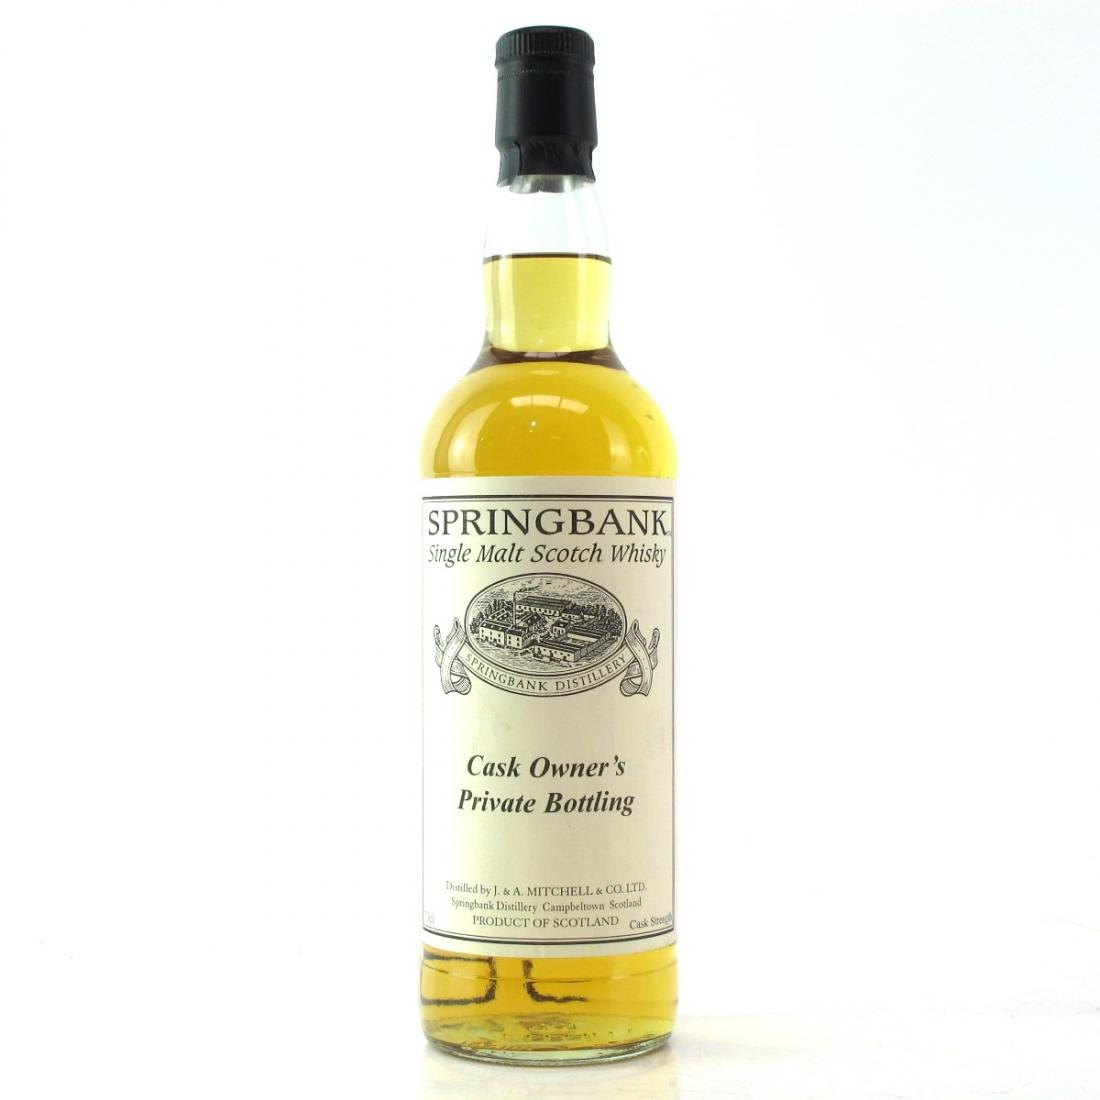 Springbank 1997 Private Cask Bottling #128 / One of 24